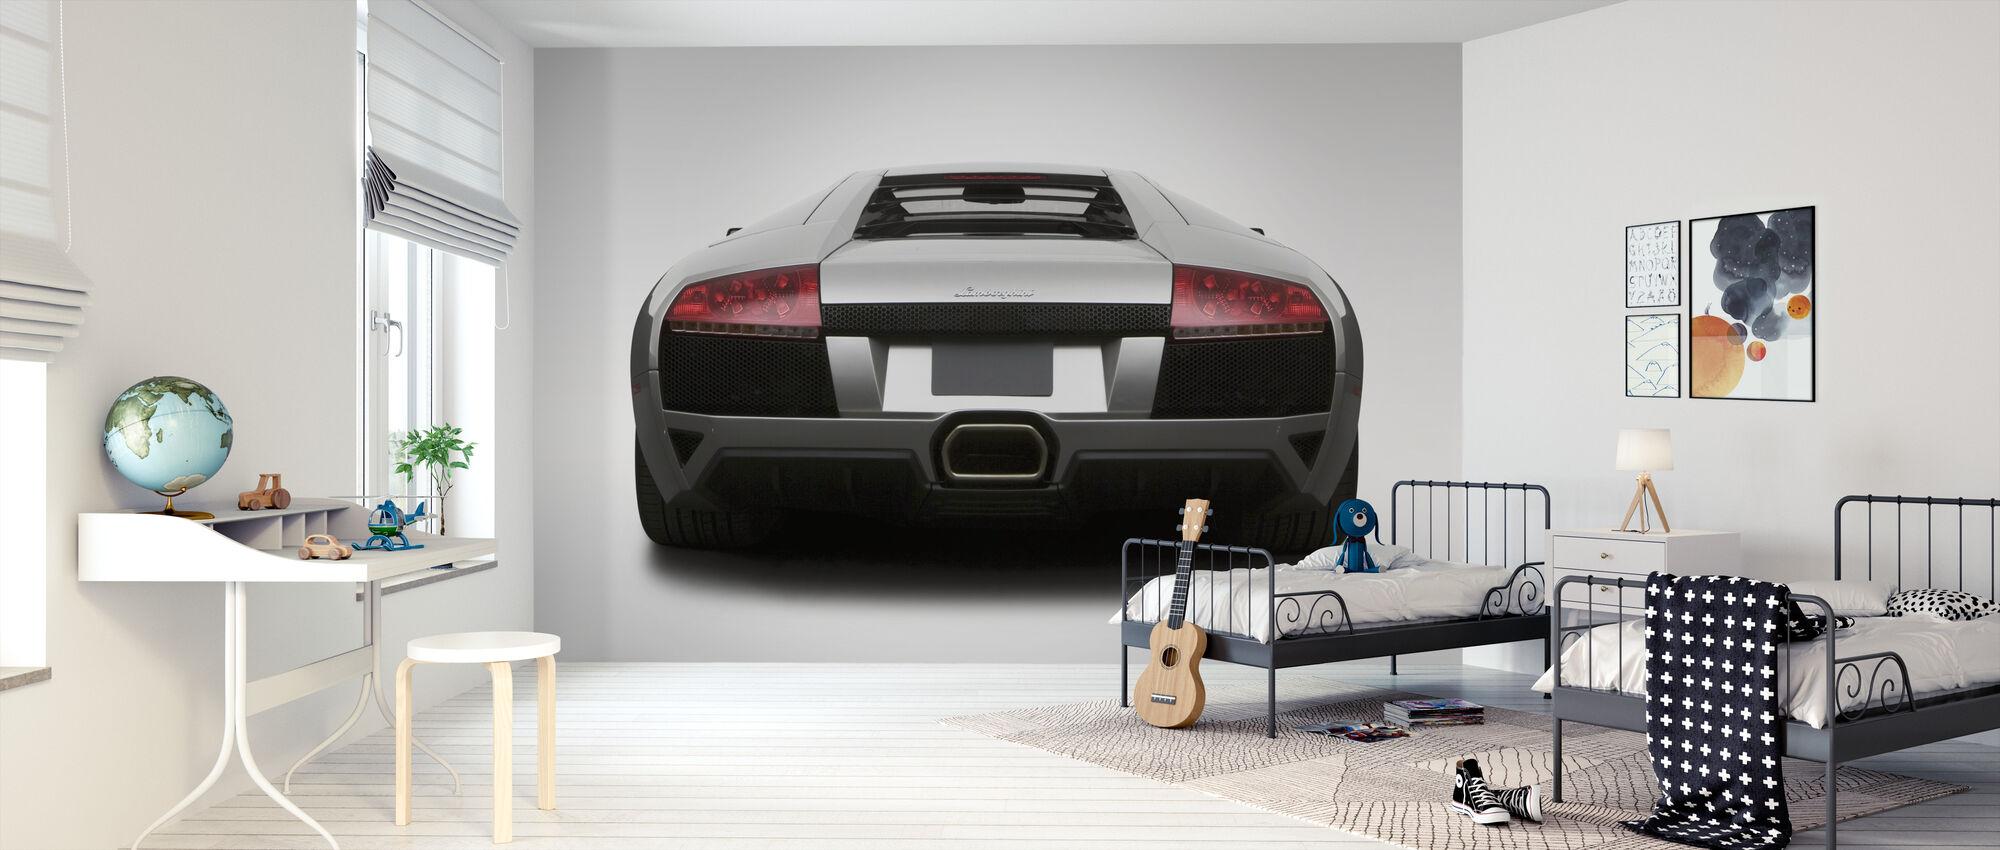 Lamborghini takana - Tapetti - Lastenhuone